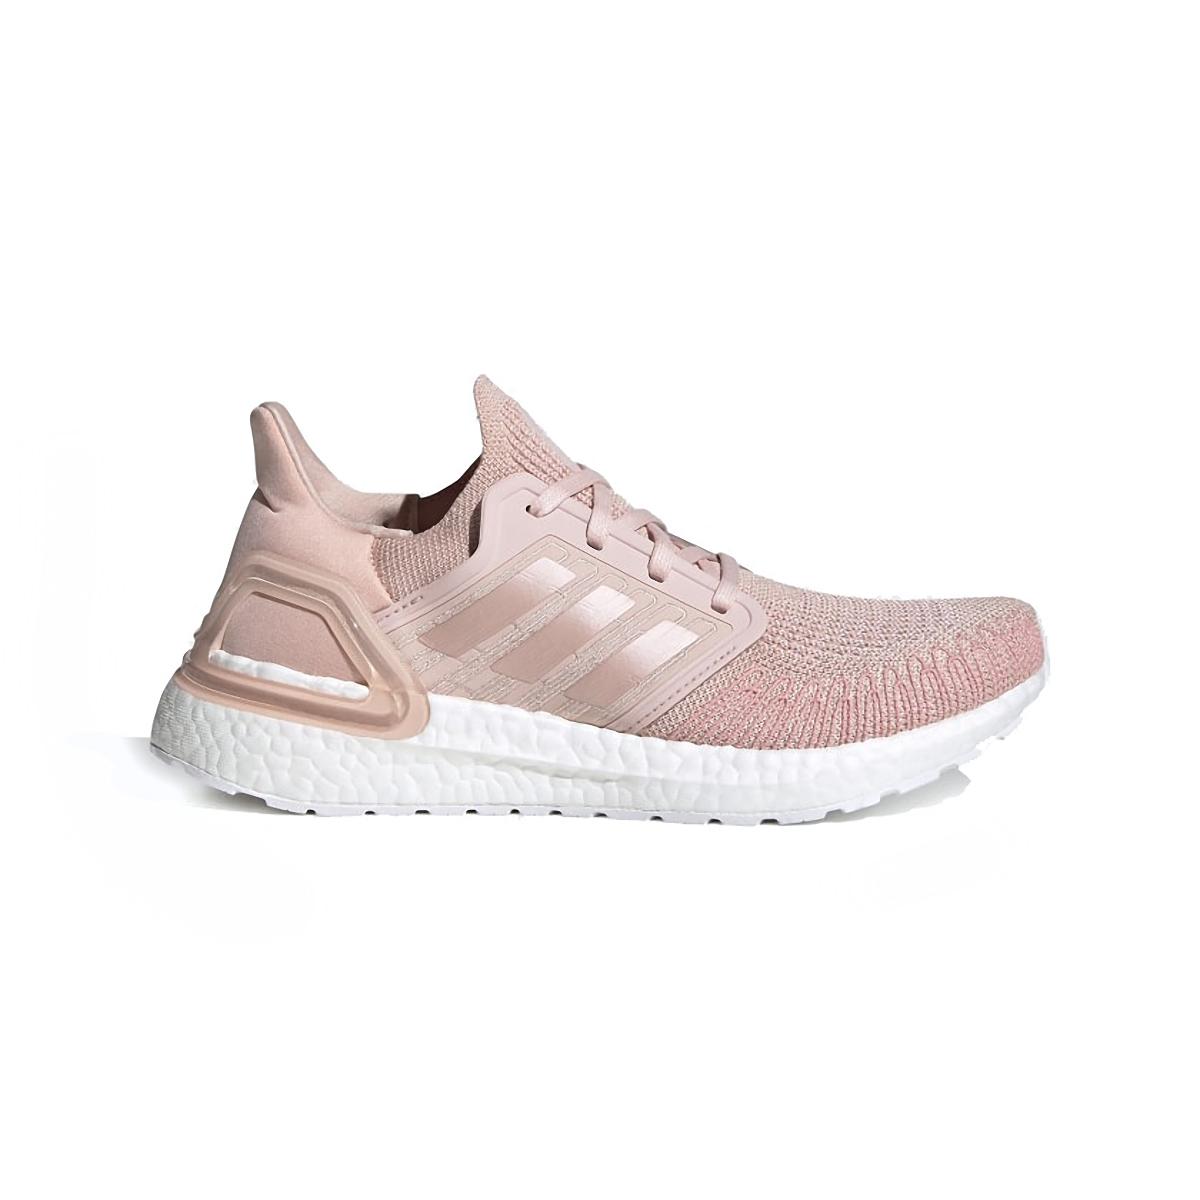 Women's Adidas Ultraboost 20 Running Shoe - Color: Vapour Pink/Cloud White - Size: 5 - Width: Regular, Vapour Pink/Cloud White, large, image 1